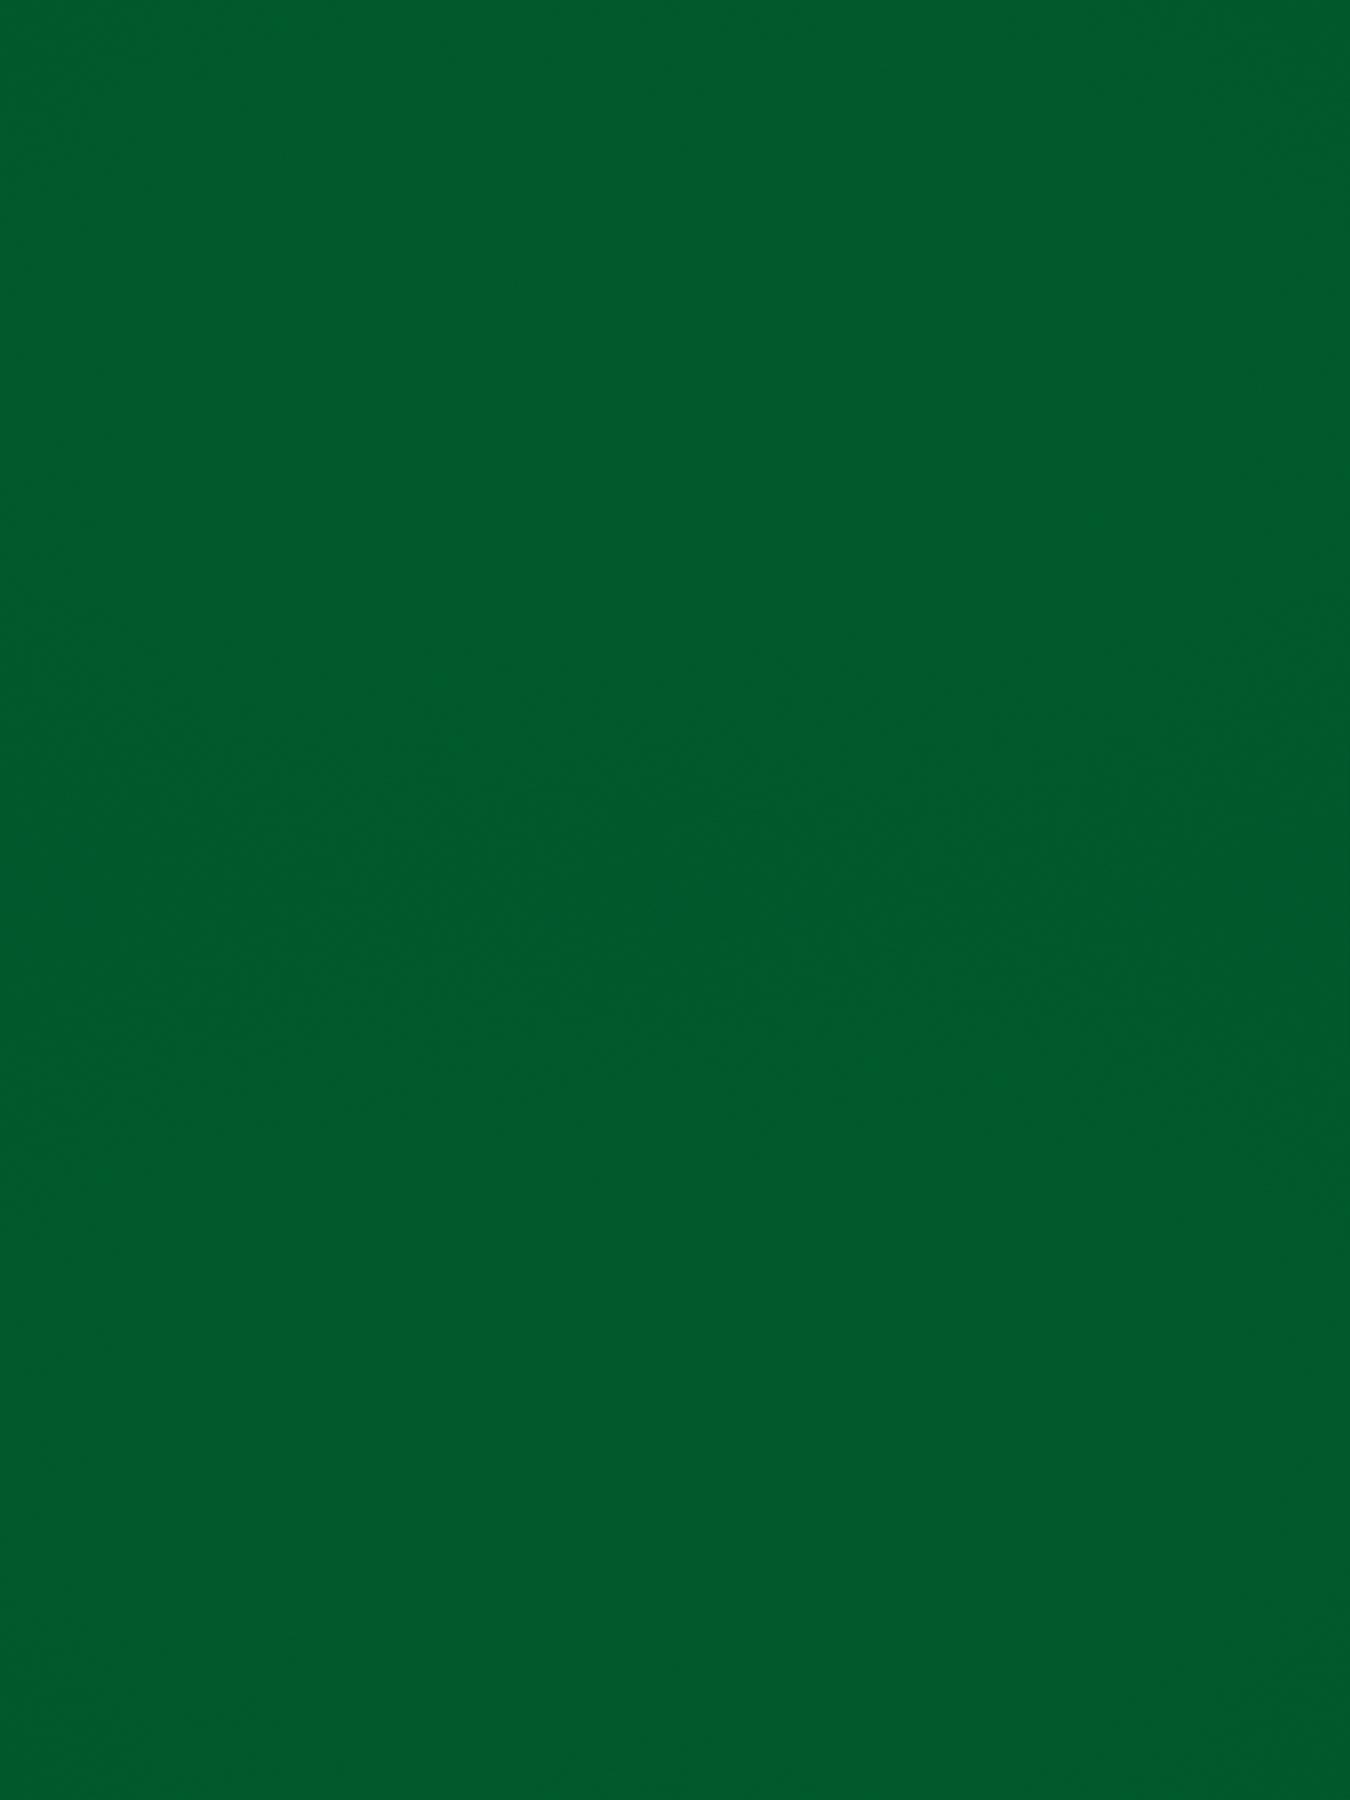 Design Amp Decor Solid Green Decor Melamine Faced